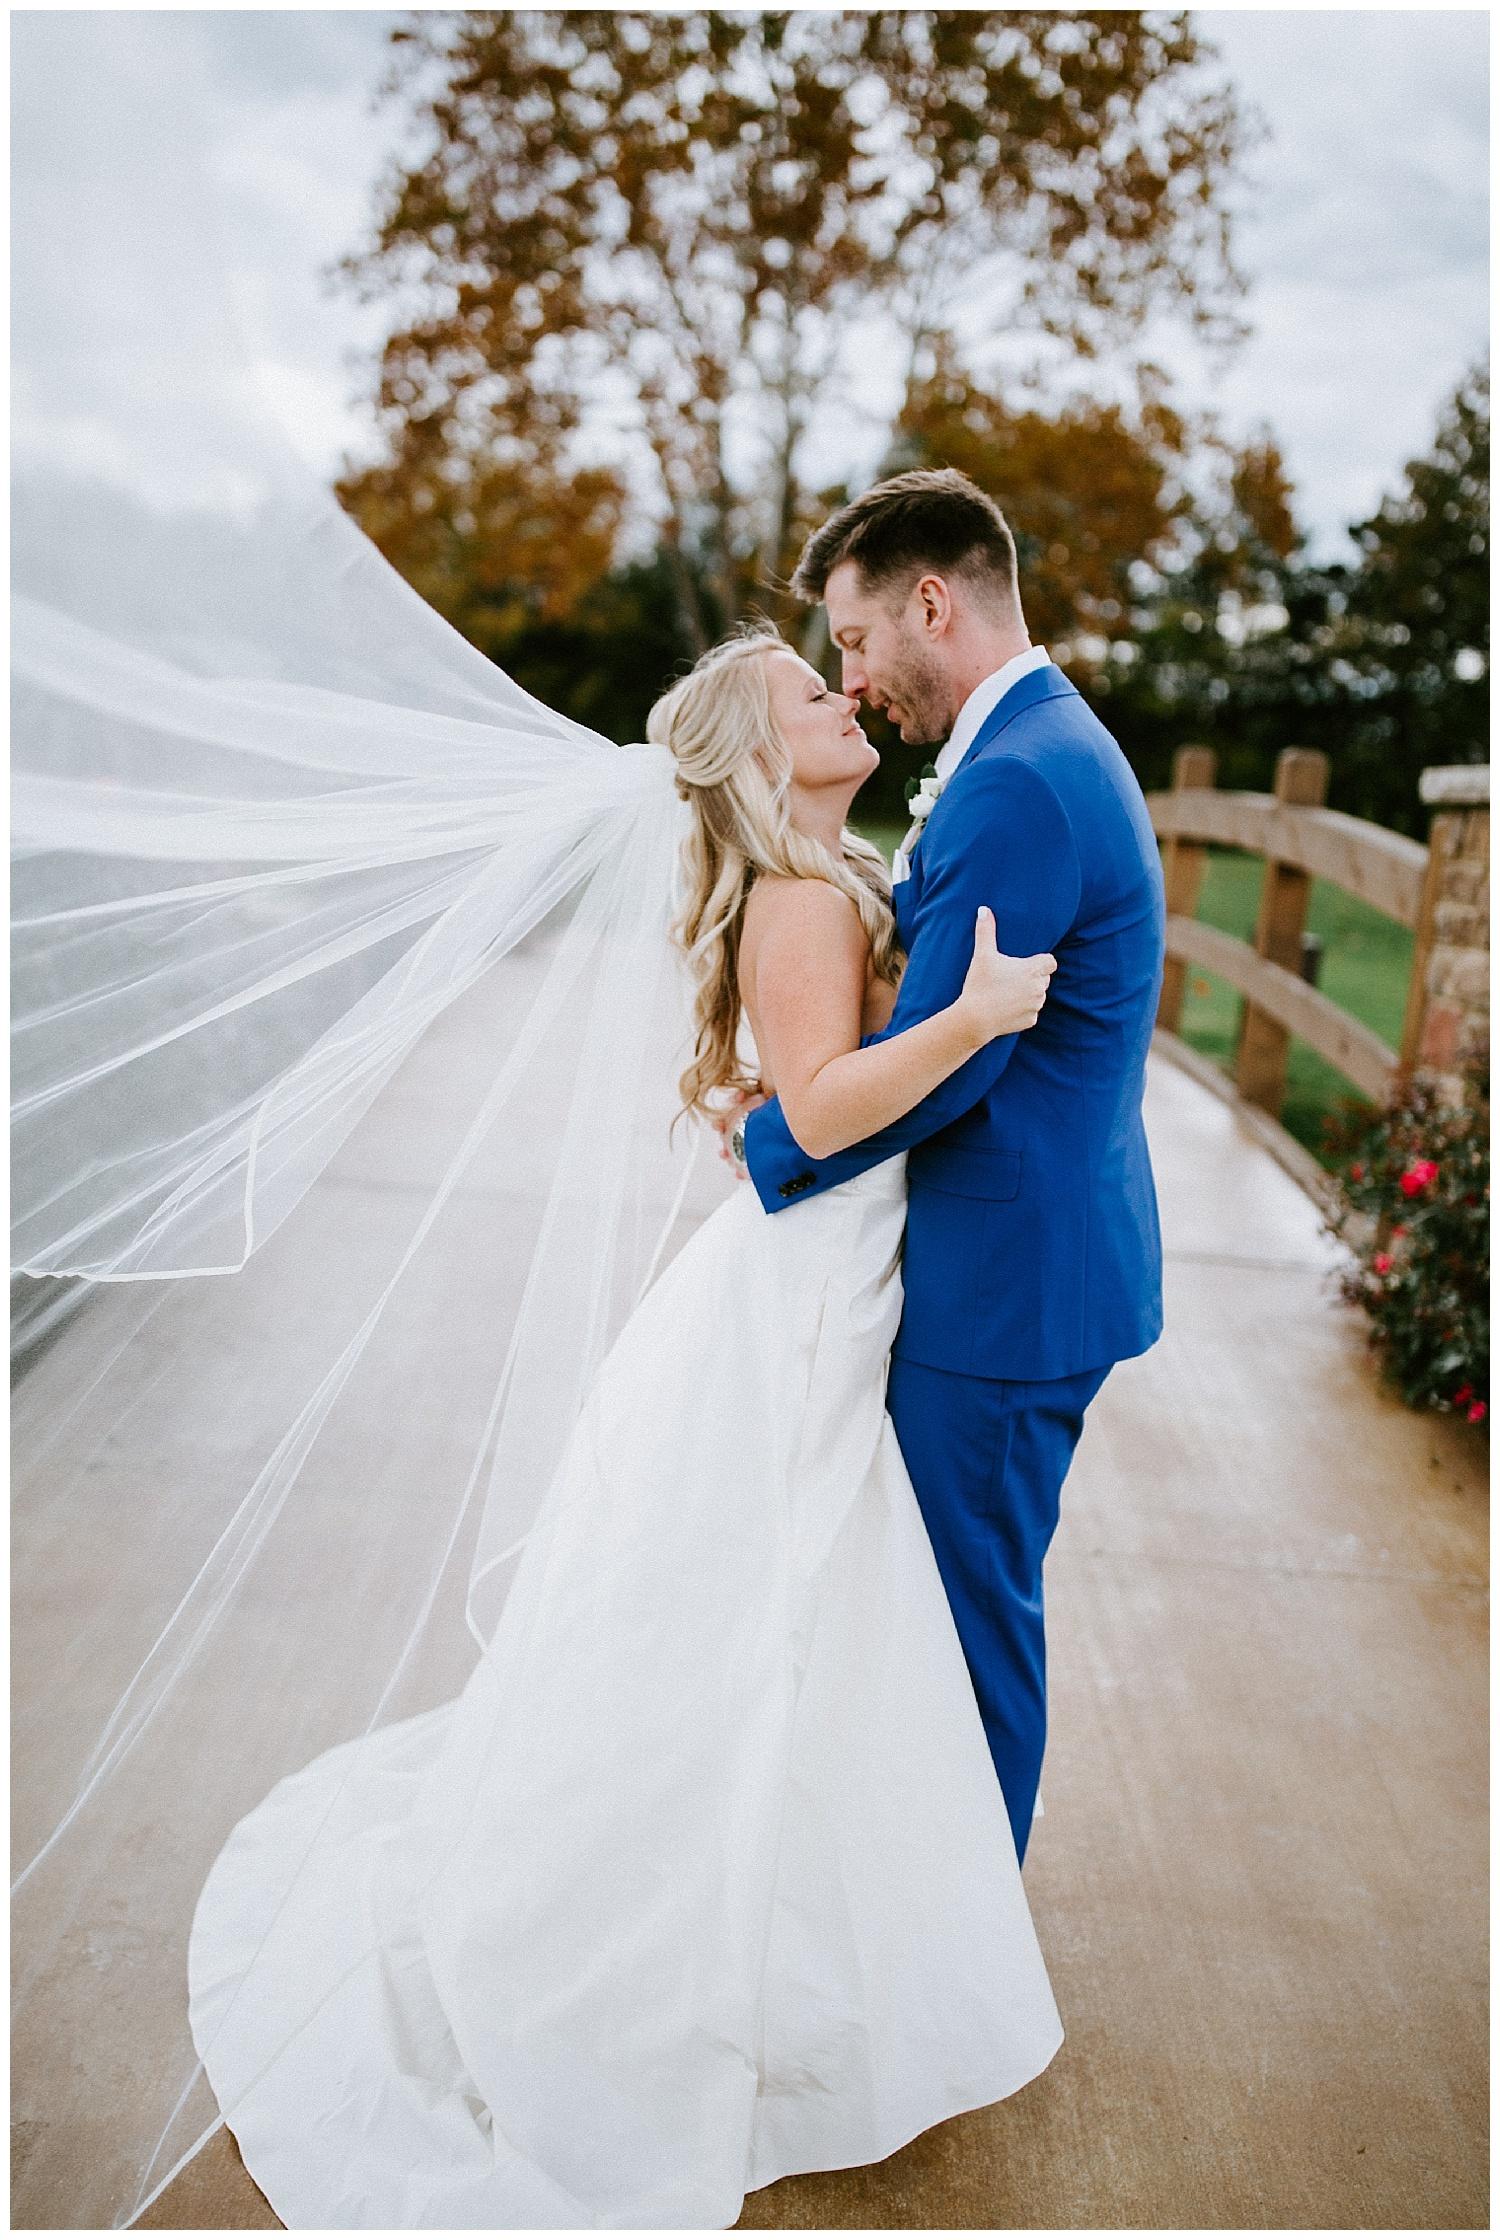 classy-wedding-sycamore_farms-nashville-tn2019-01-22_0022.jpg